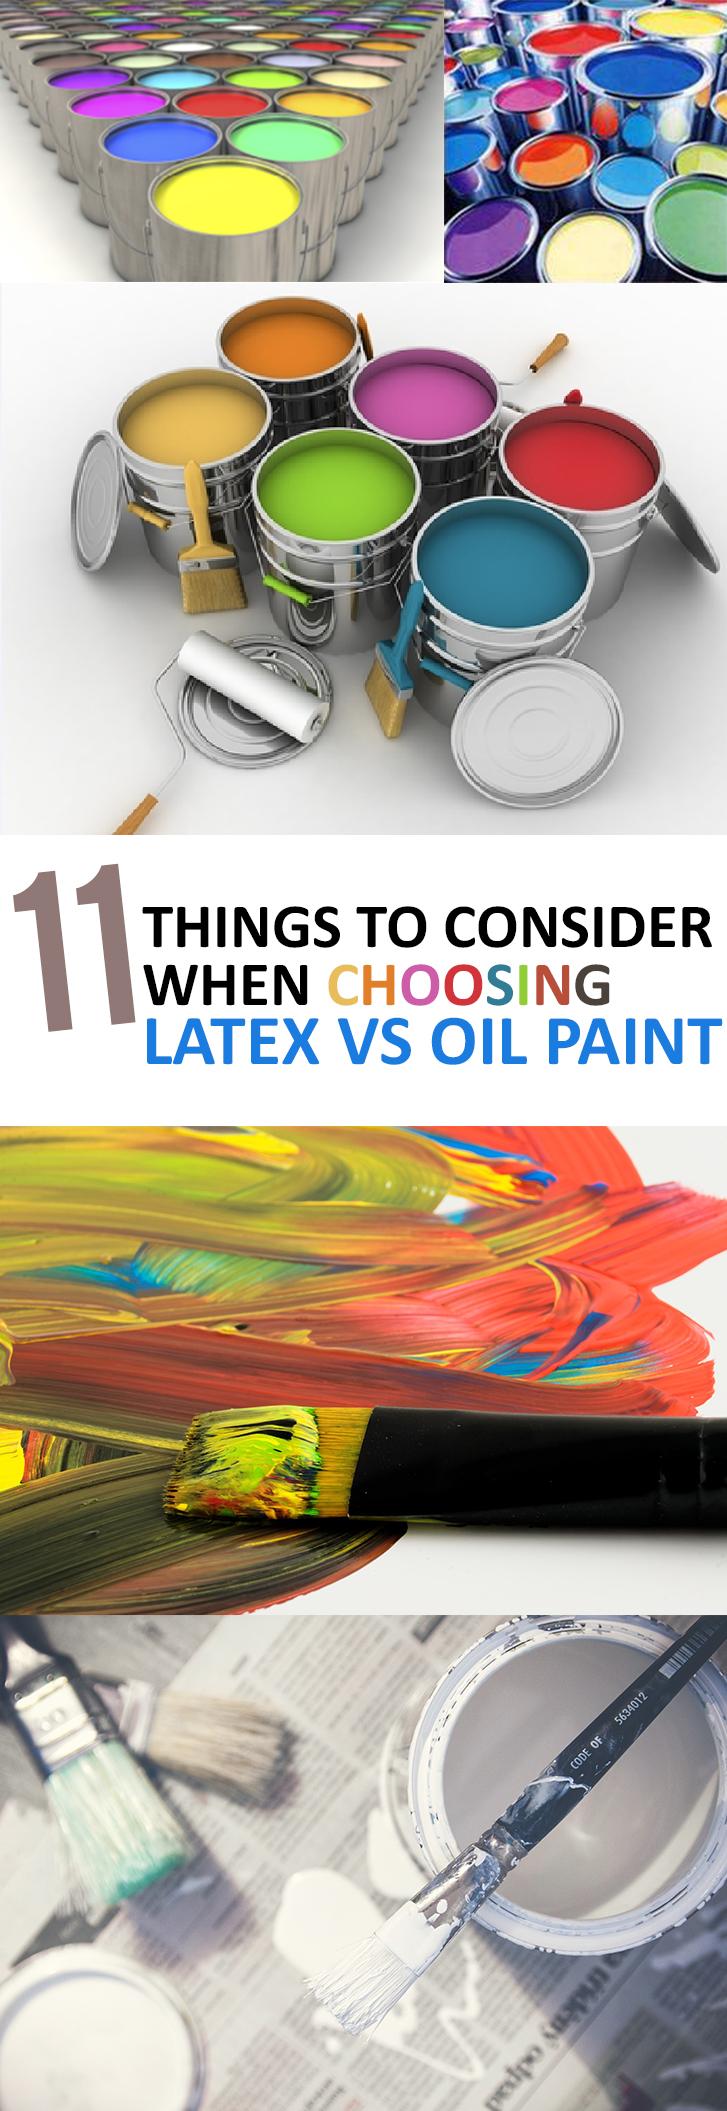 11 Things to Consider When Choosing Latex vs Oil Paint